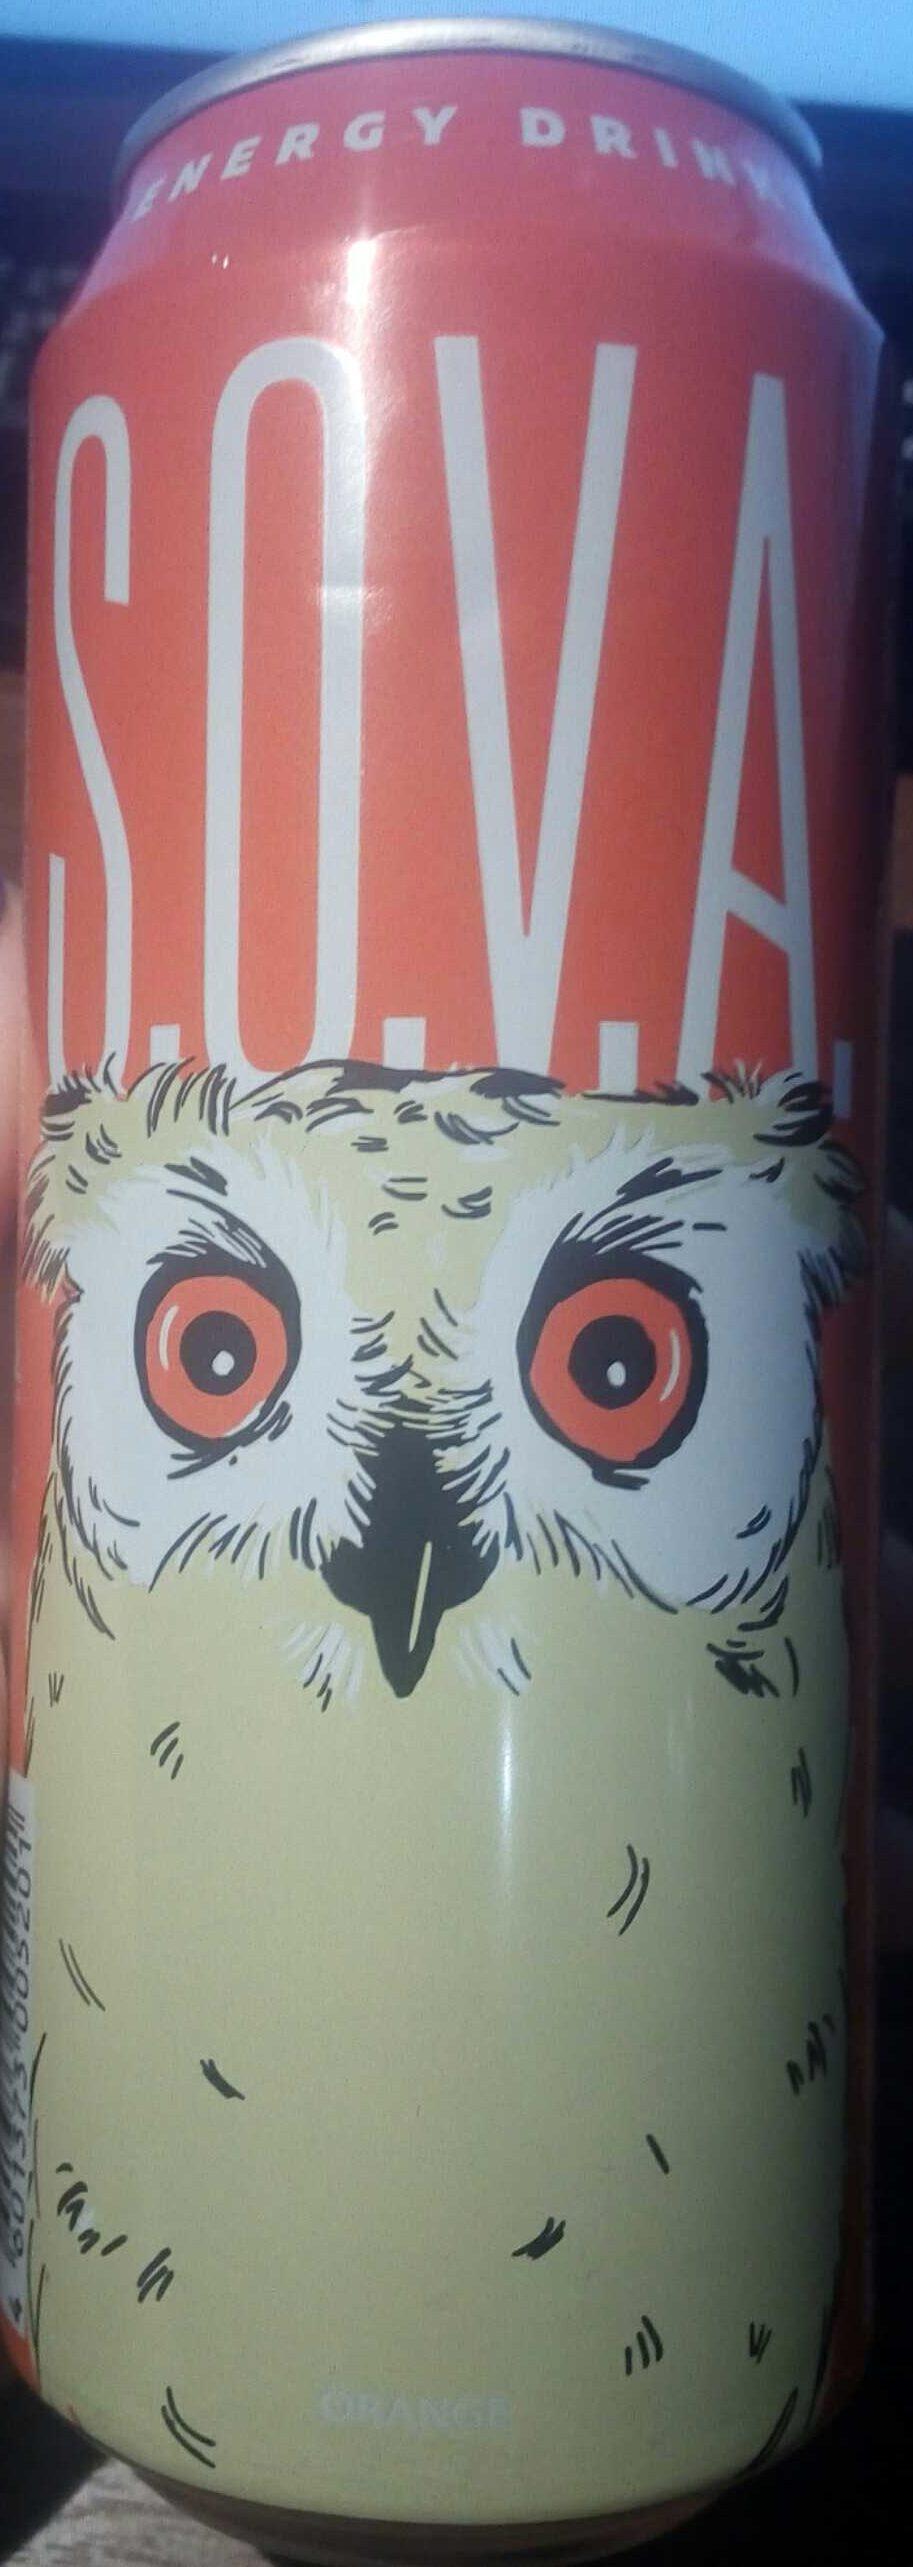 S.O.V.A. Orange - Produit - ru